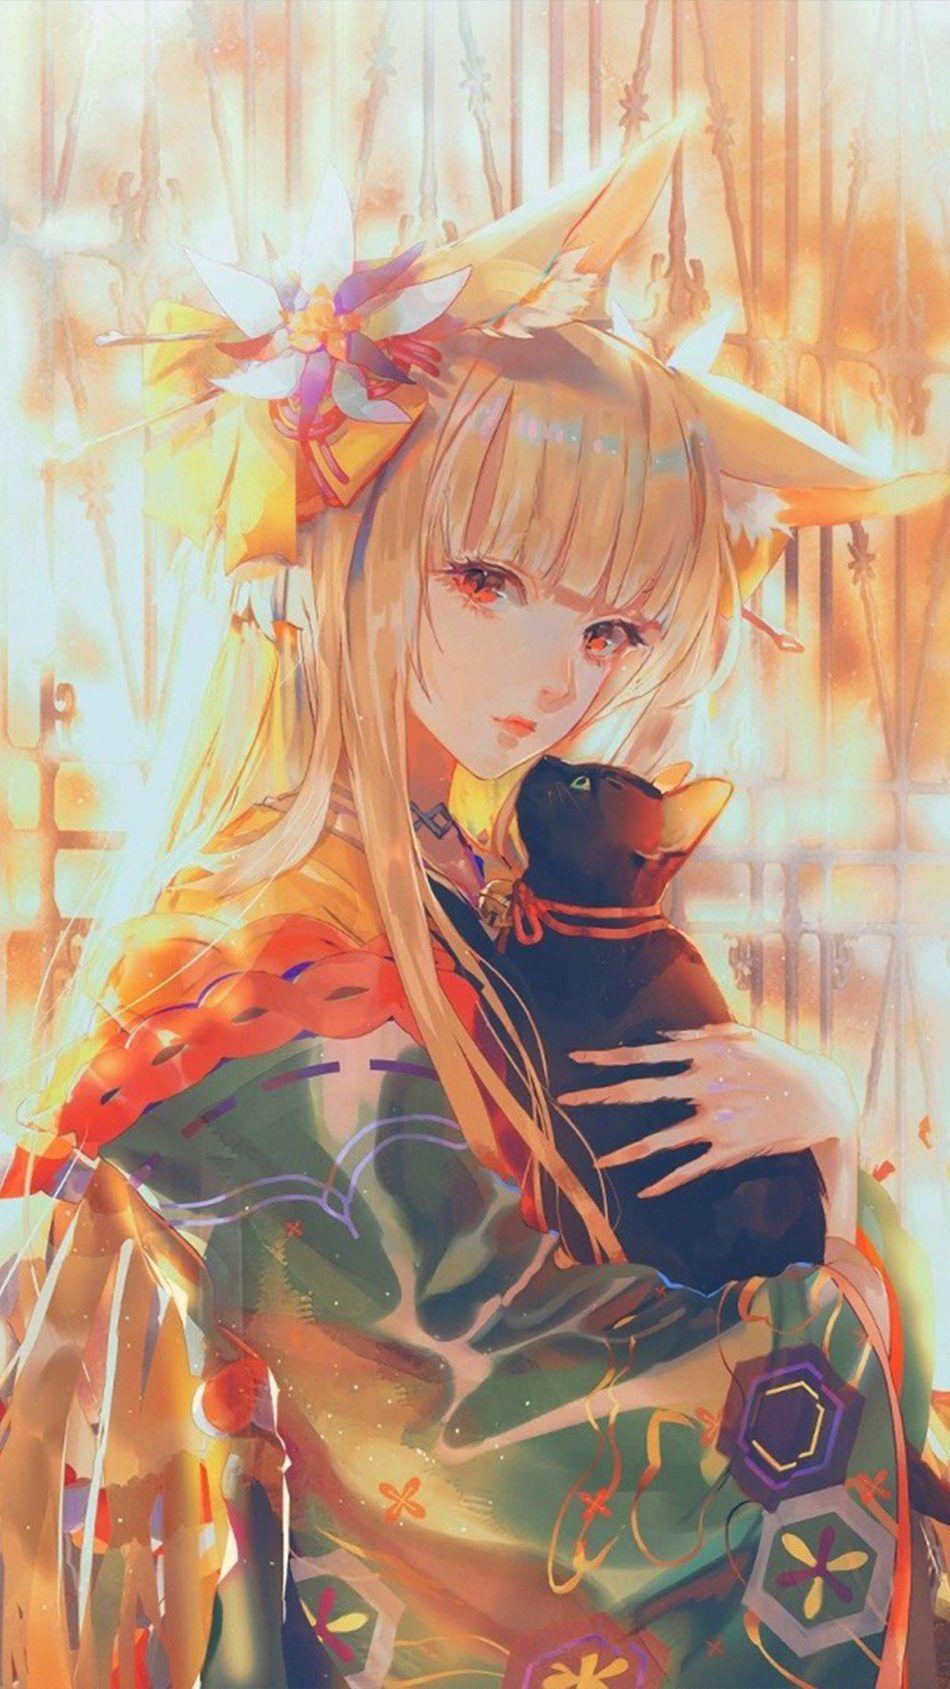 Anime 4k Mobile Wallpapers Wallpaper Cave